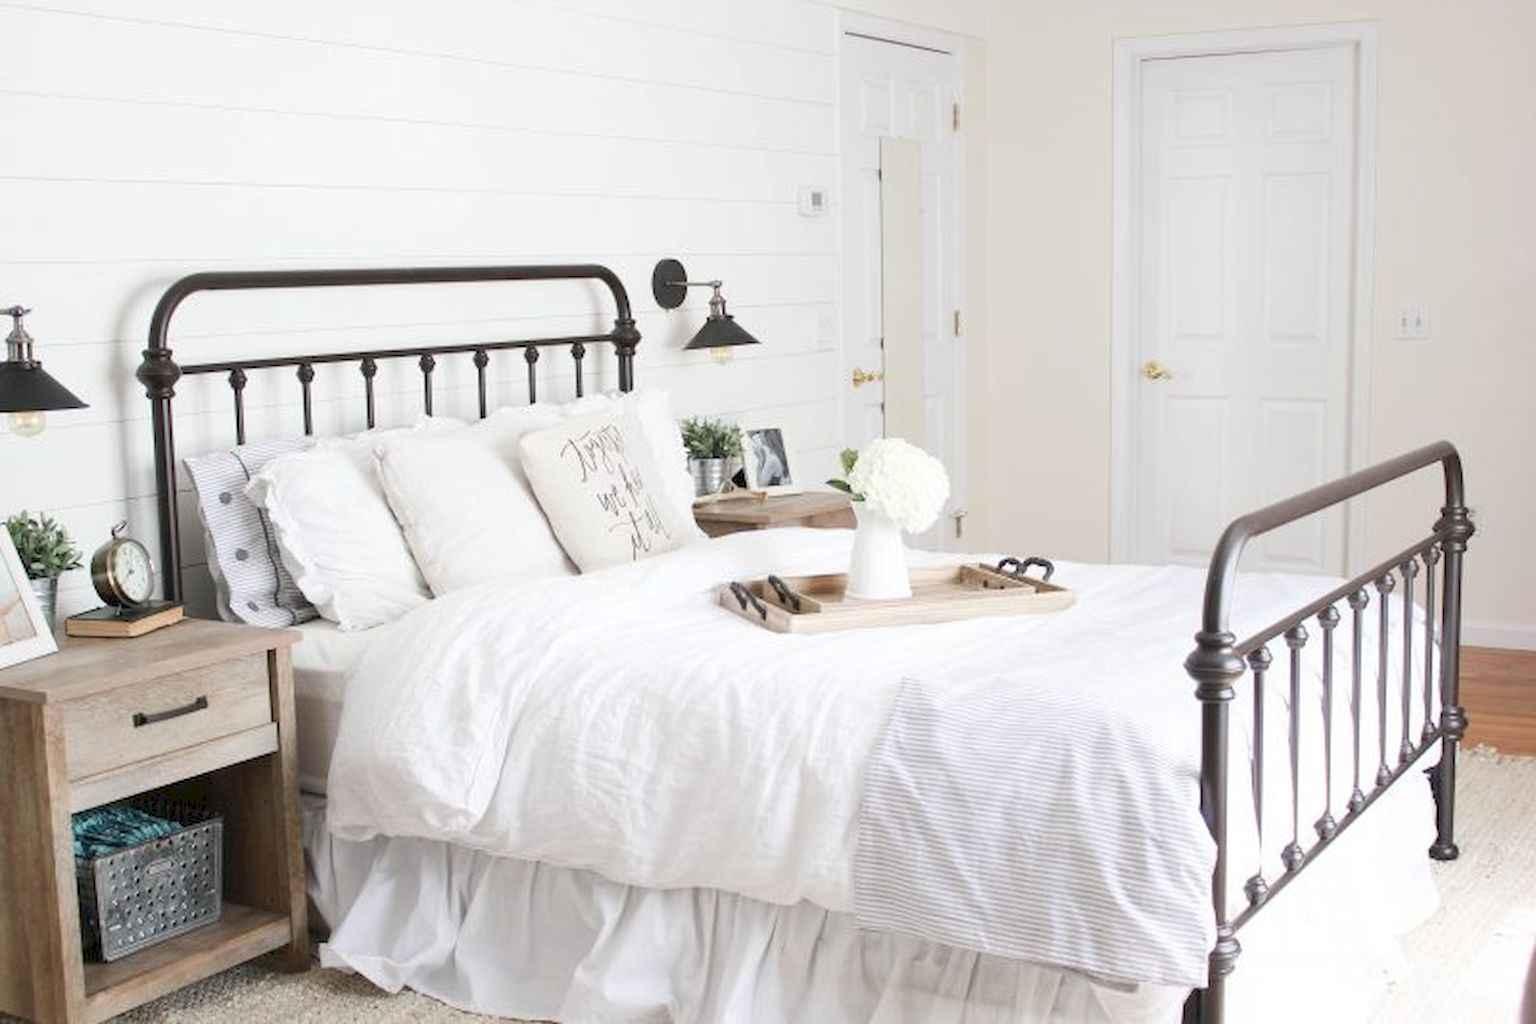 100 Stunning Farmhouse Master Bedroom Decor Ideas (37)